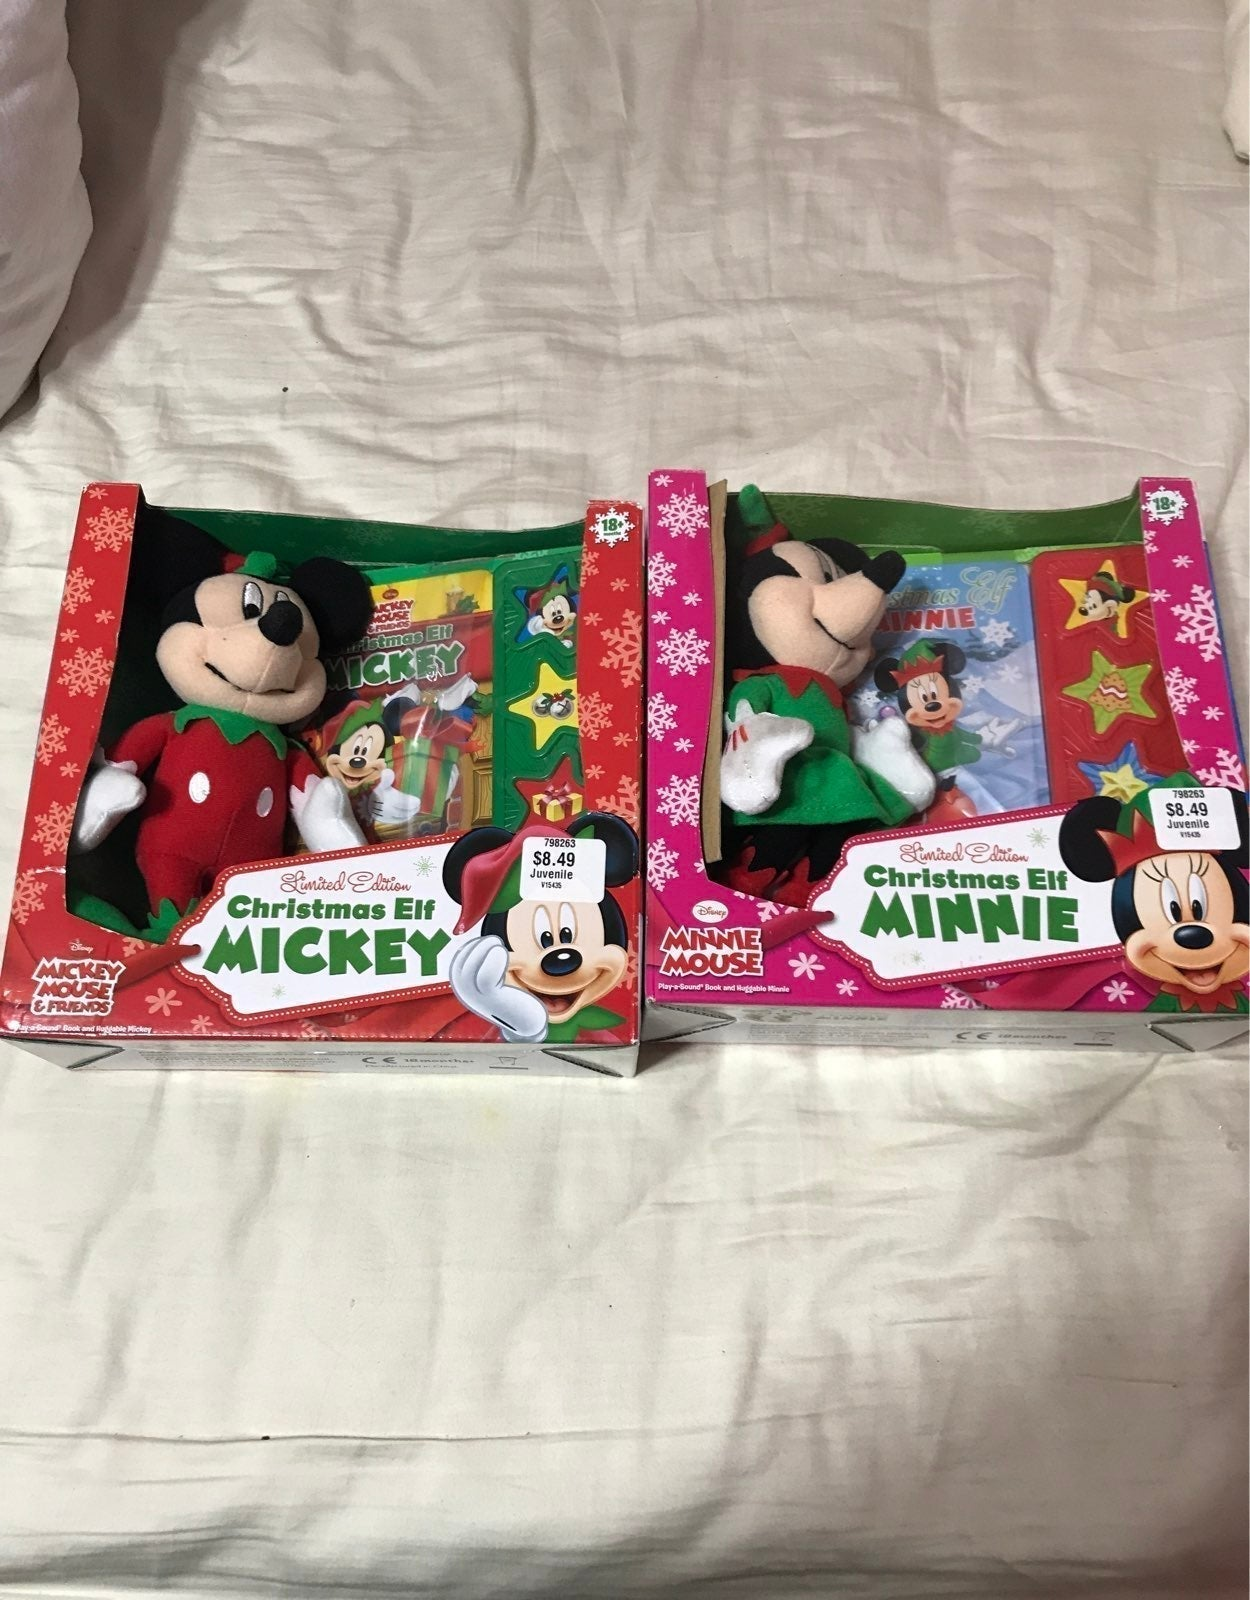 2 Disney Christmas Elf Mickey Plush book